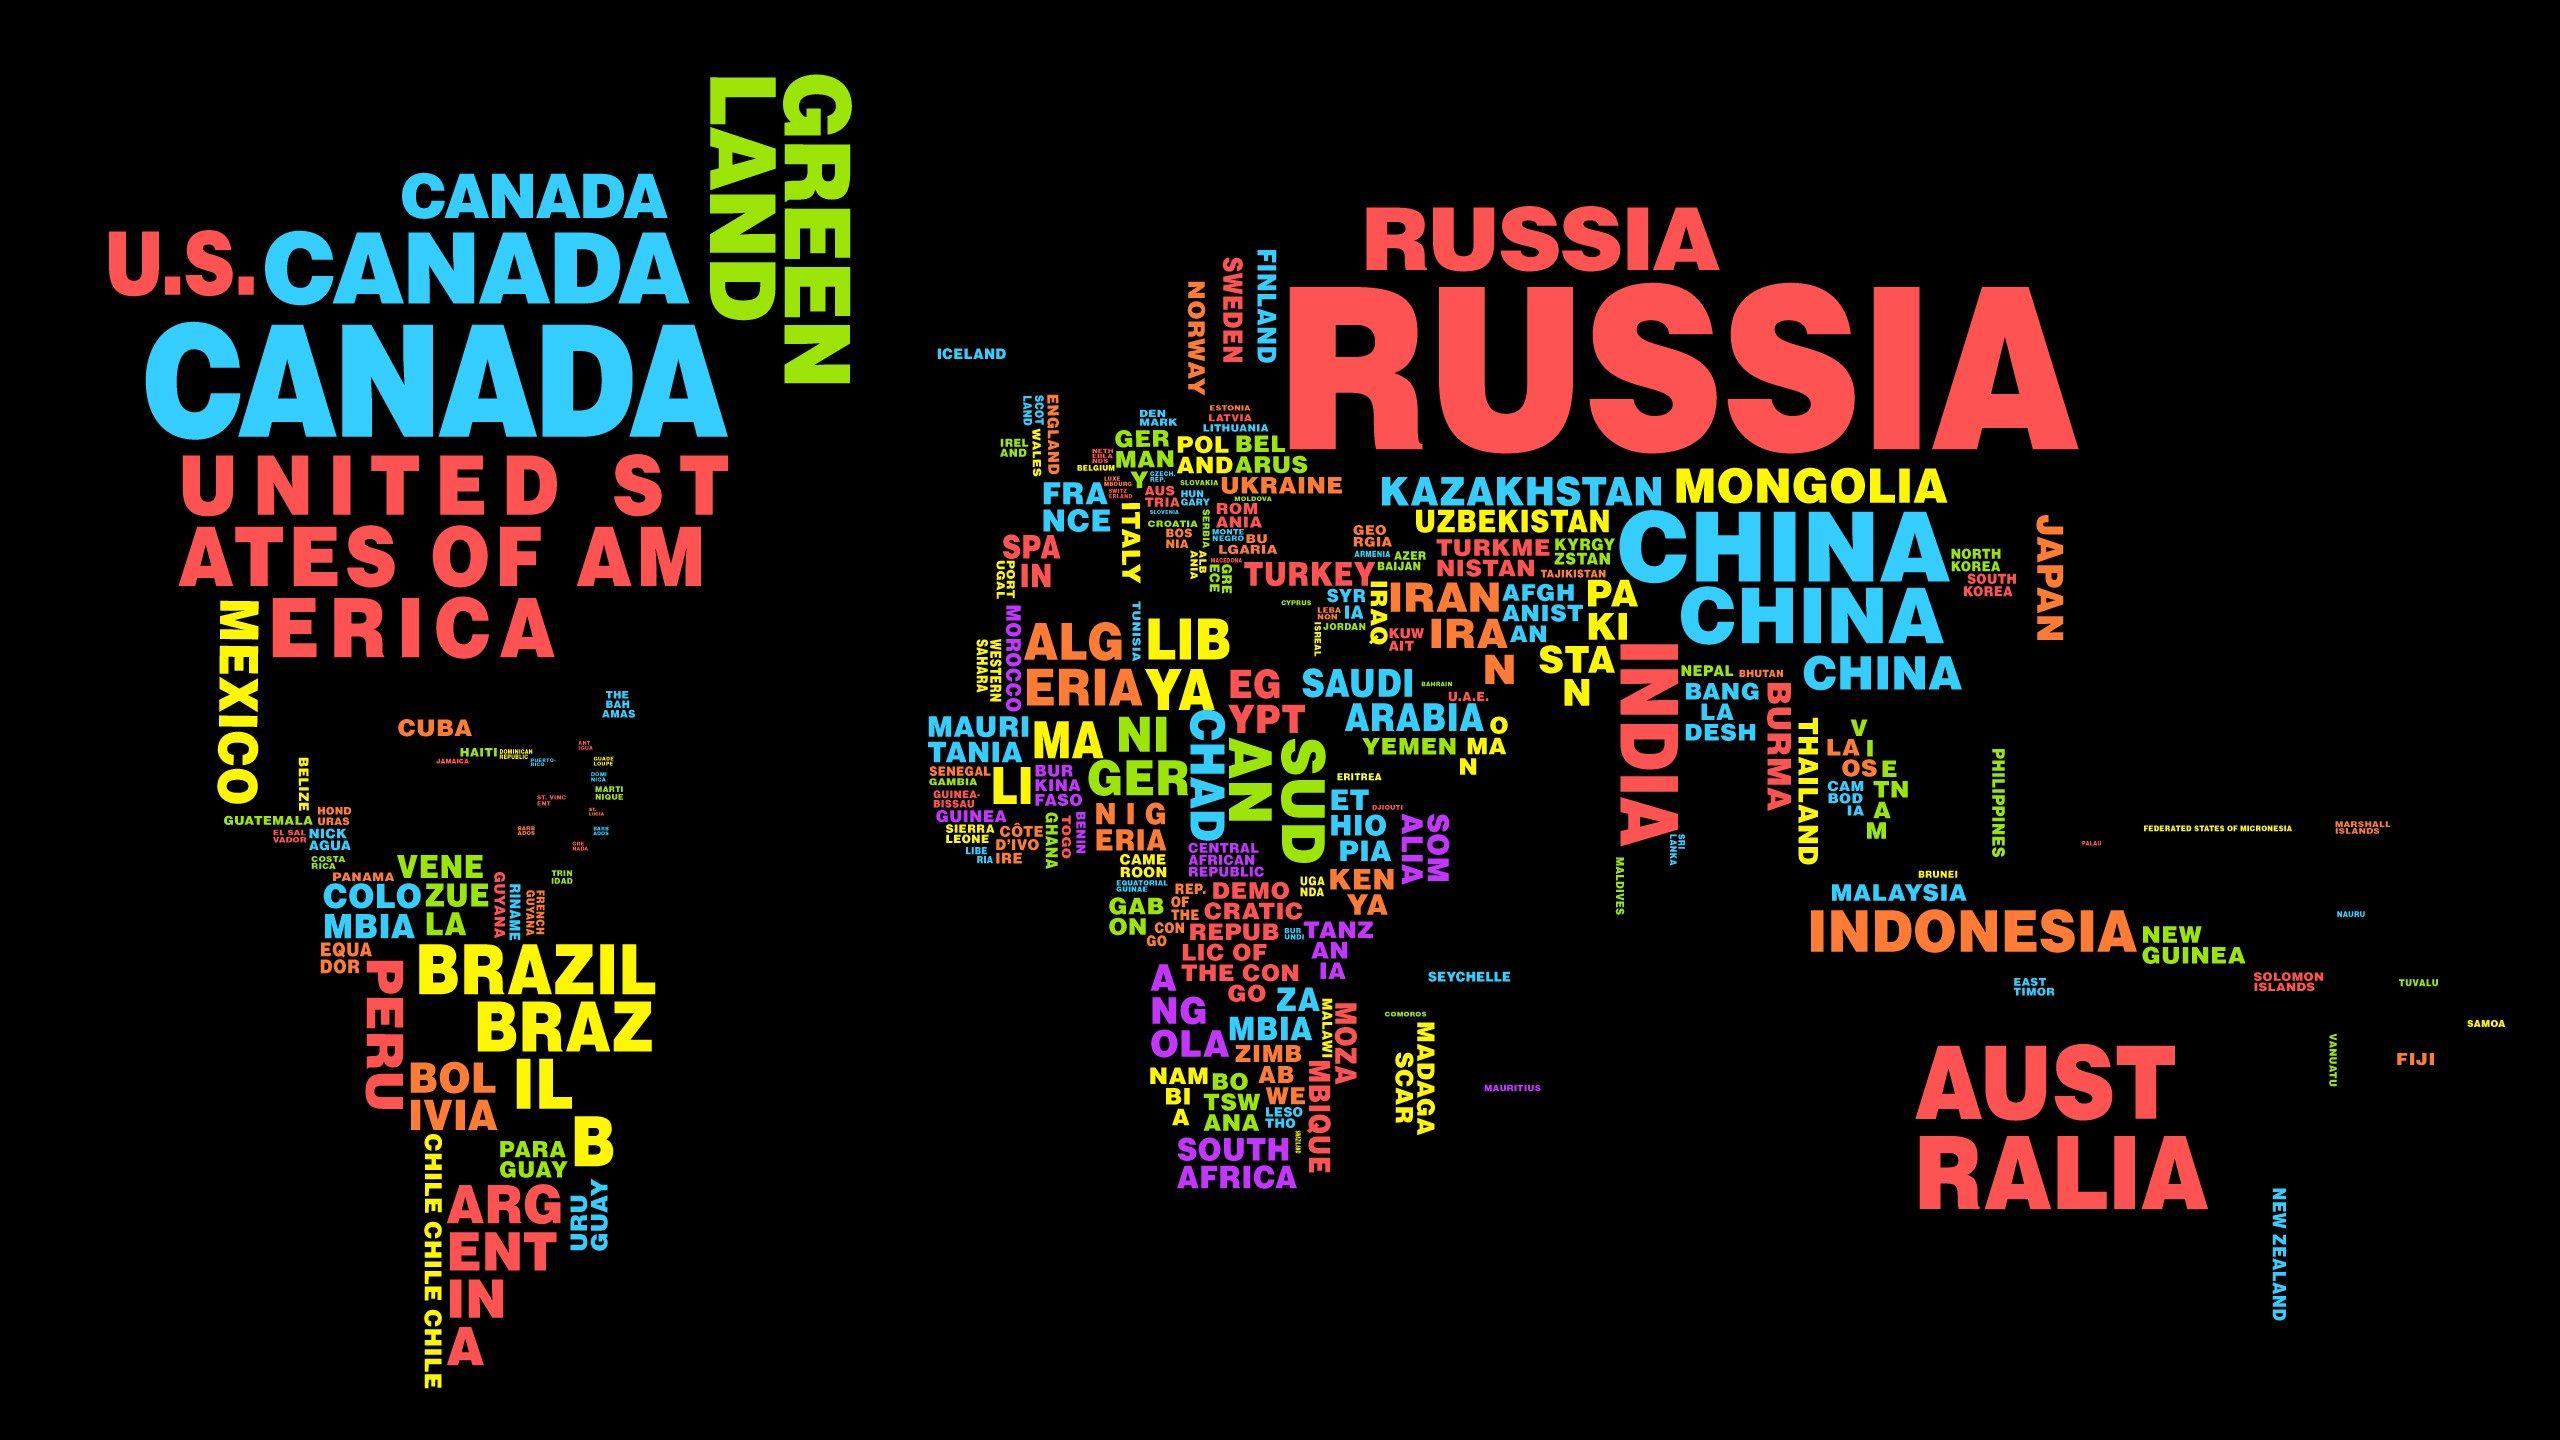 240284 2560x1440 World Map Desktop Wallpapers Hd Peta Dunia Finland Peta